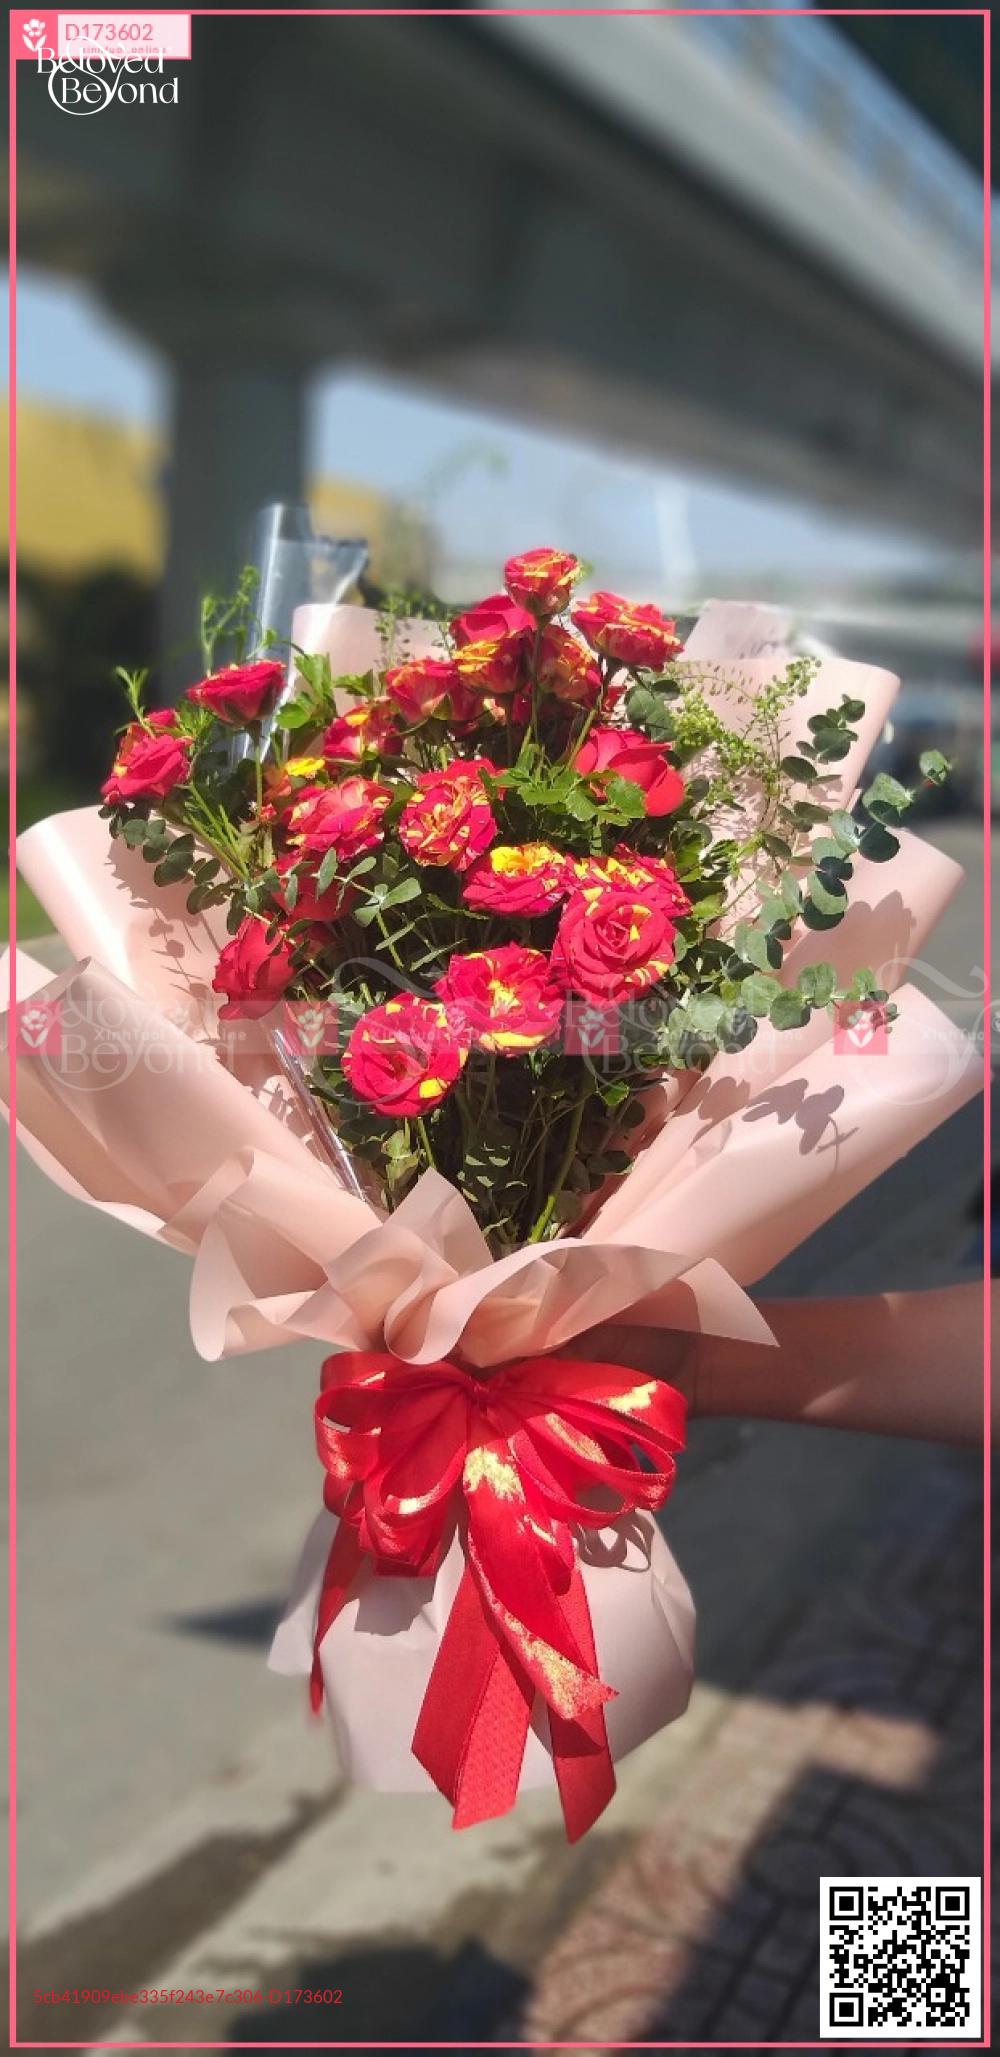 Dịu dàng - D173602 - xinhtuoi.online